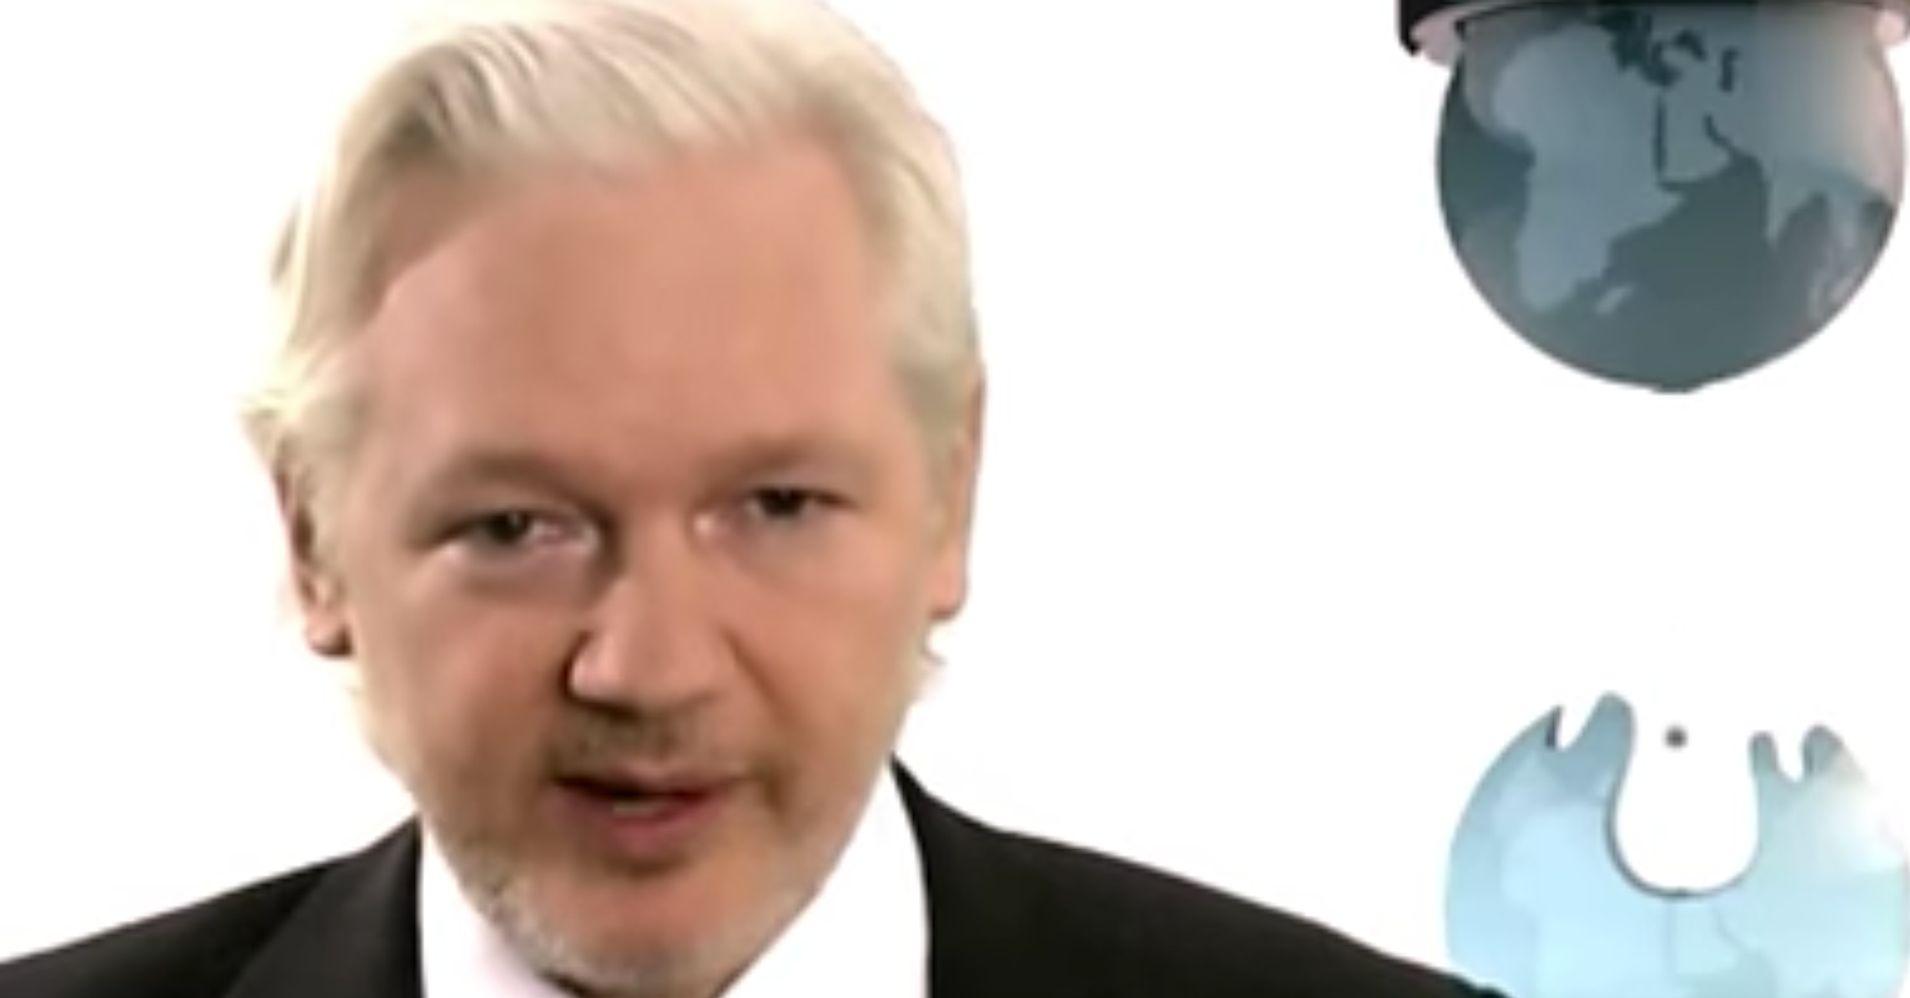 Julian Assange Says Wikileaks Is Working On Hacking Trump's Tax Returns